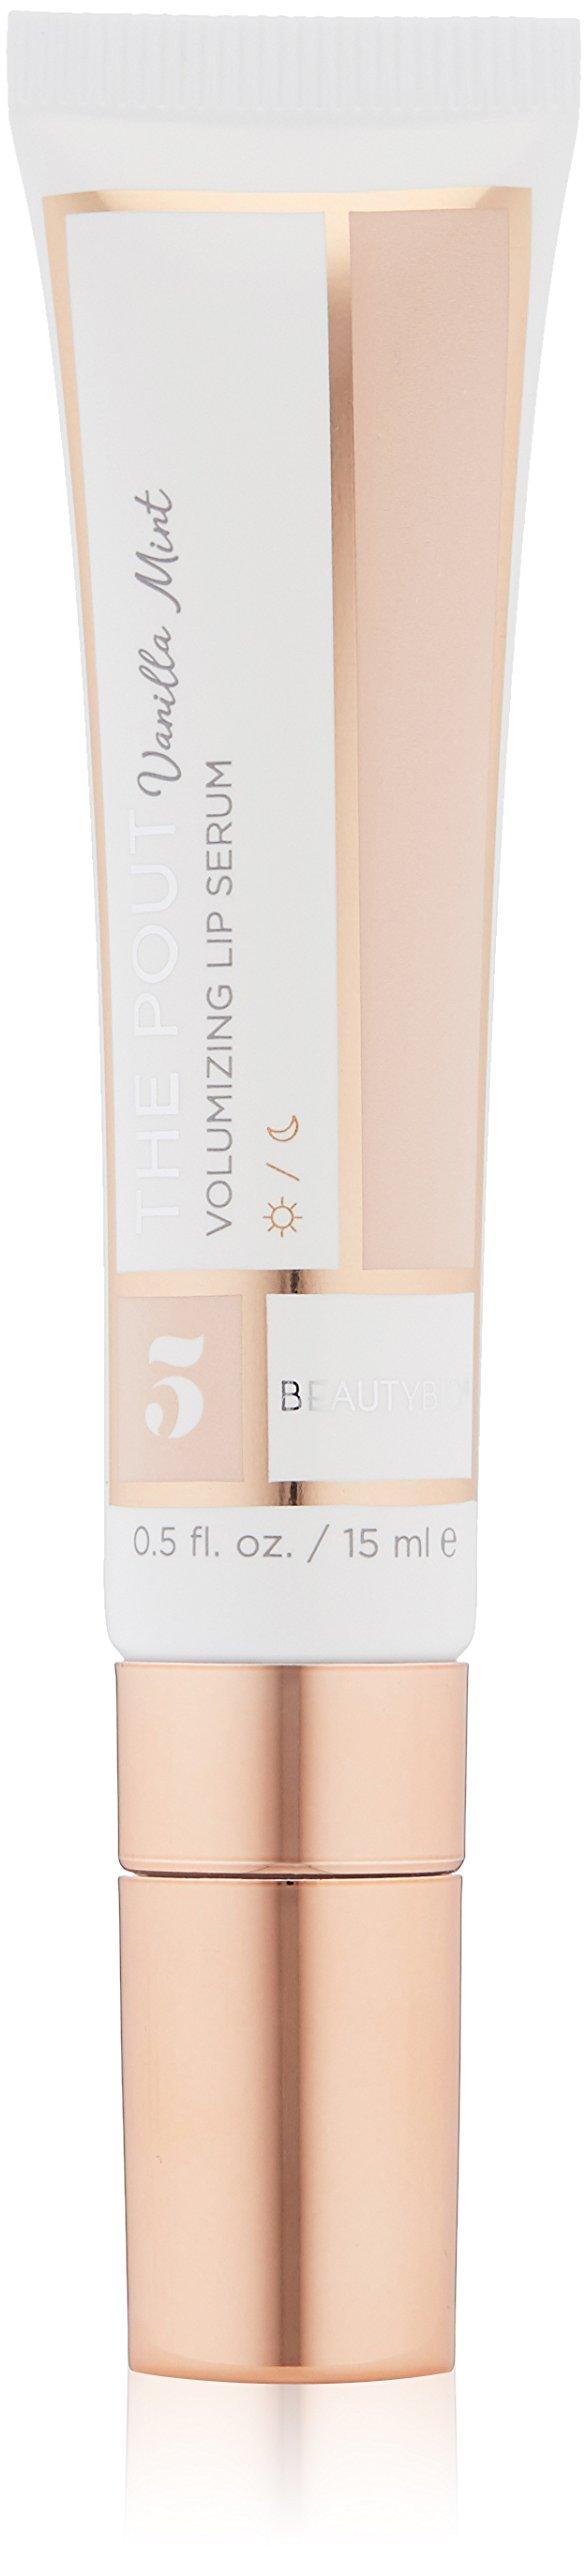 The Pout  Vanilla Mint Hyaluronic Acid Collagen Plumping Lip Serum